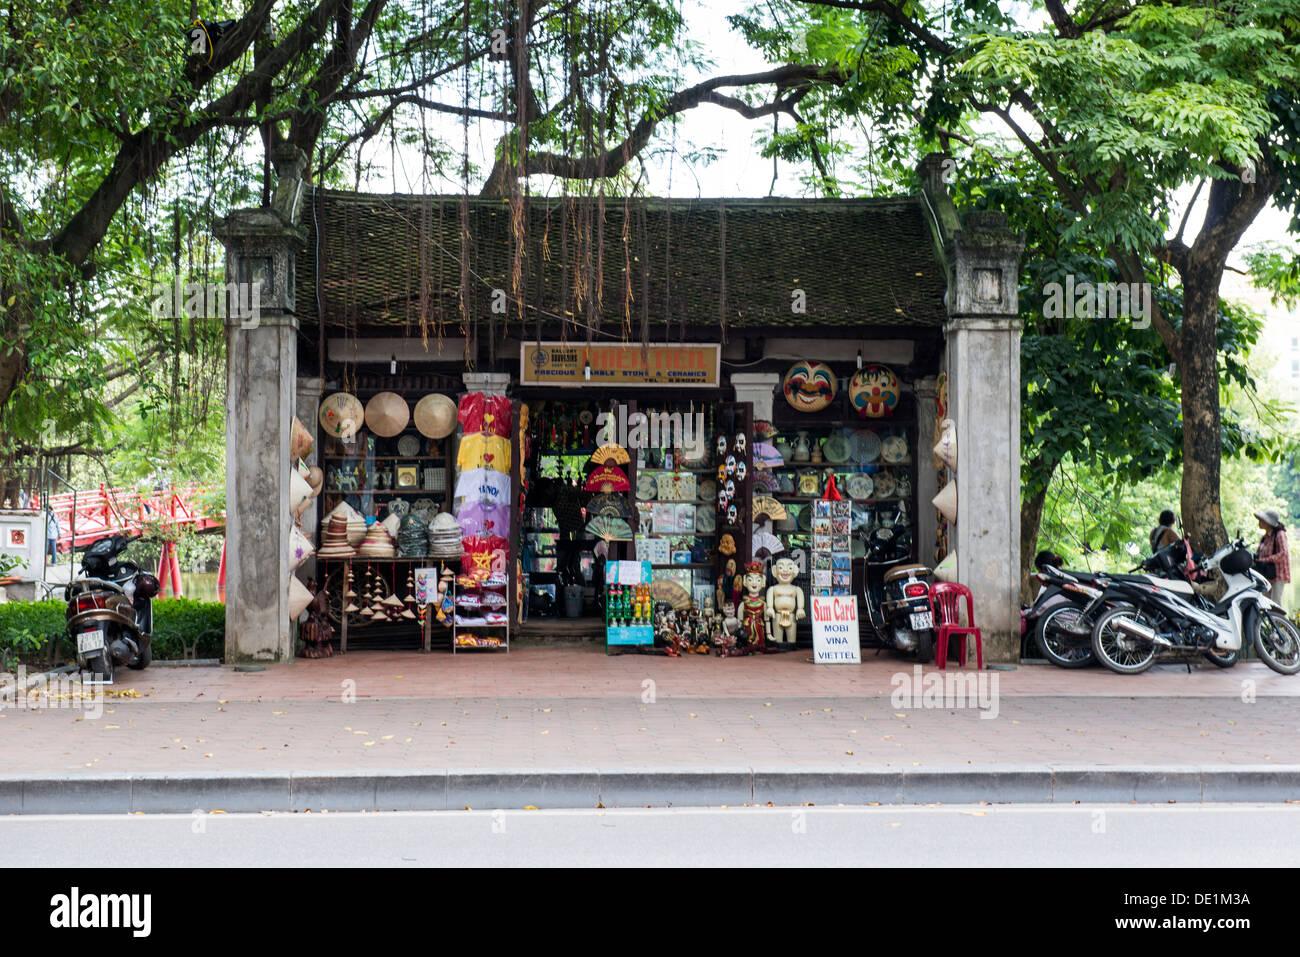 The Hoan Kiem souvenir shop, Hanoi Vietnam - Stock Image